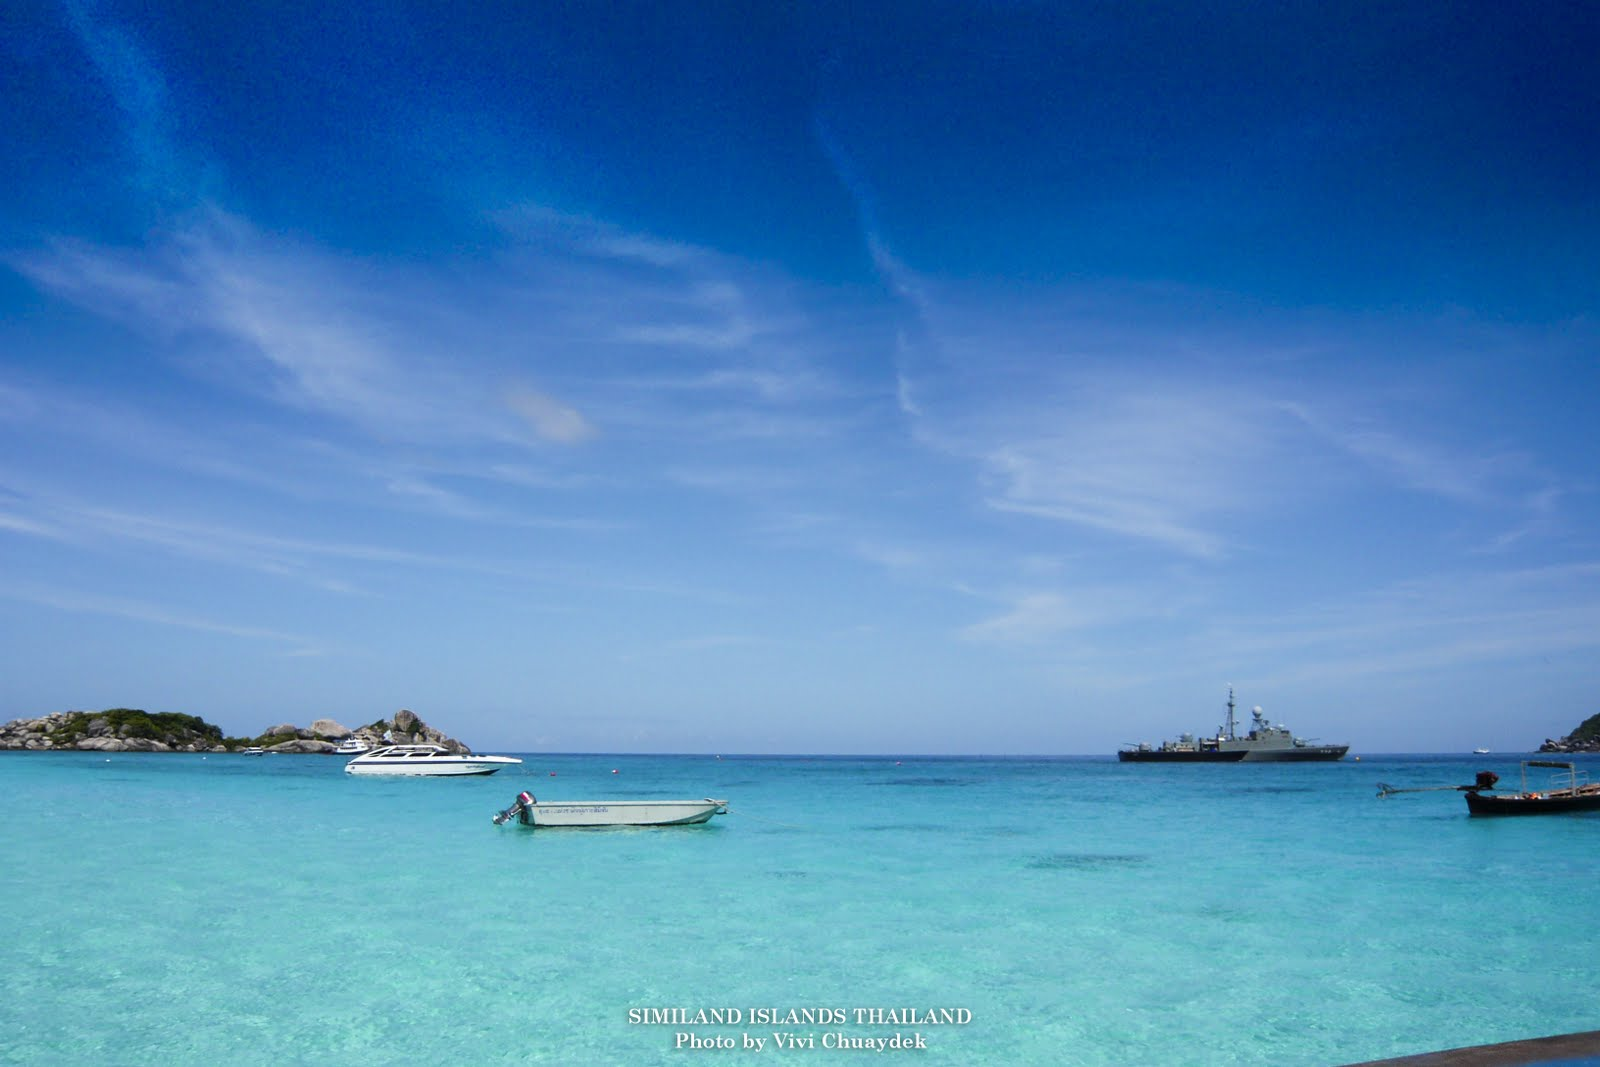 Travel and Photo Blog: Paradise in Thailand: Similan Islands, Phang Nga